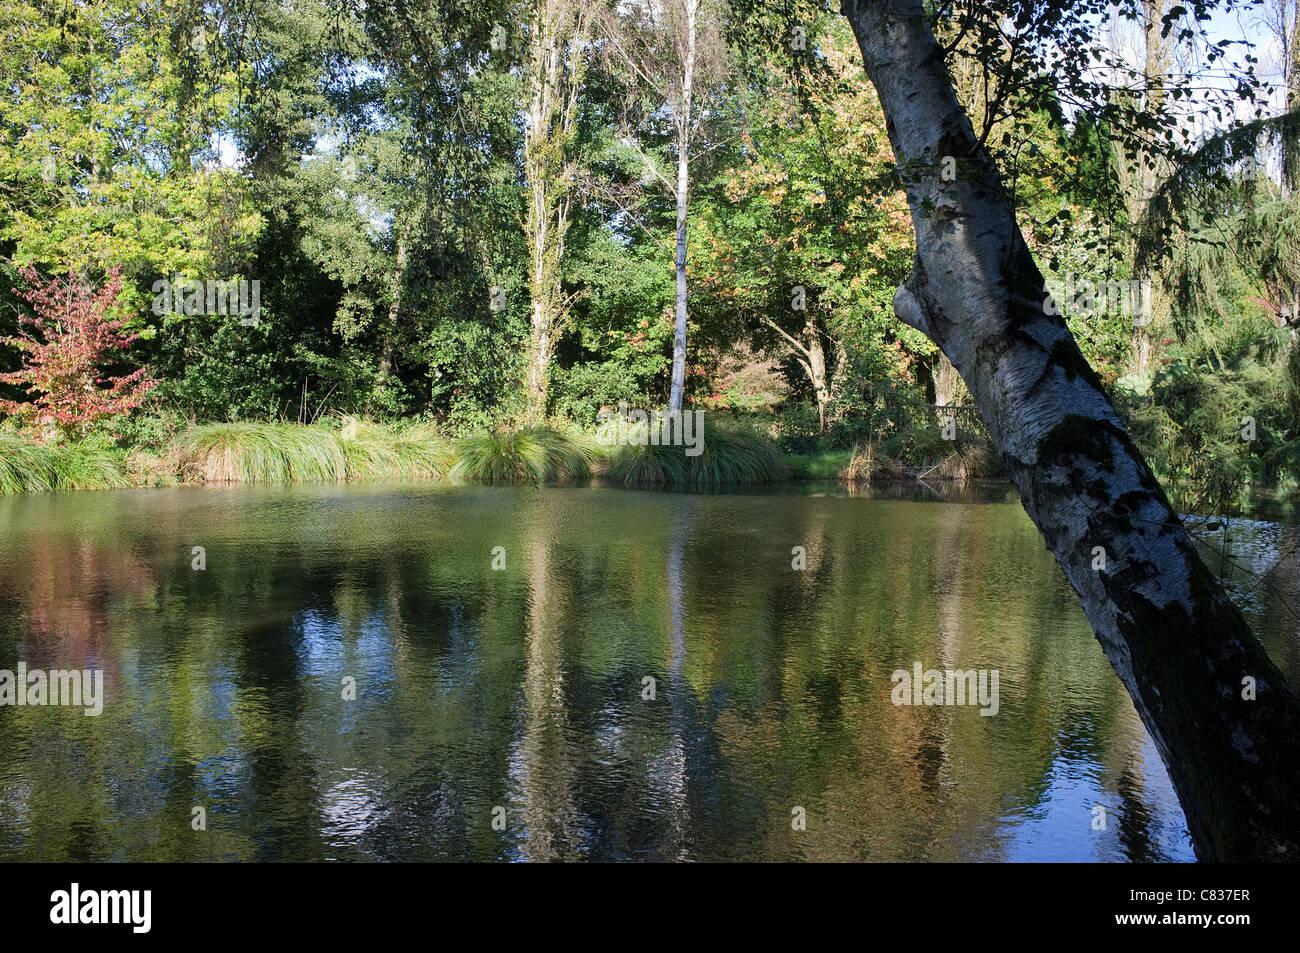 Reflexionen See Windlesham Arboretum-3 Stockbild